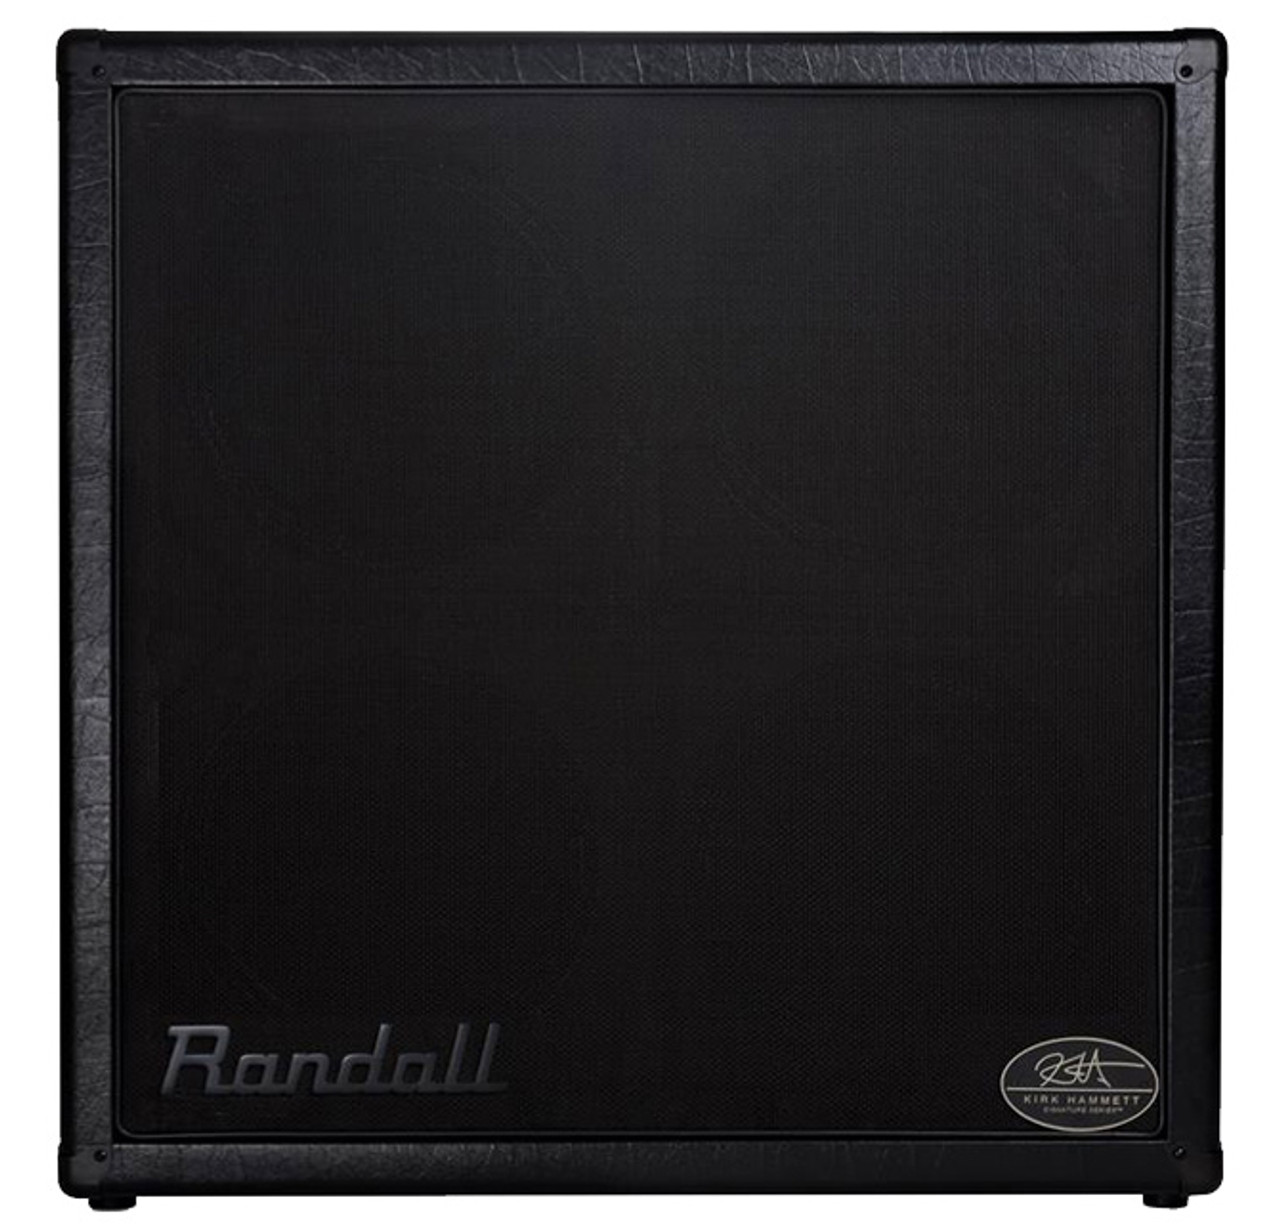 Randall KH412-V30-U